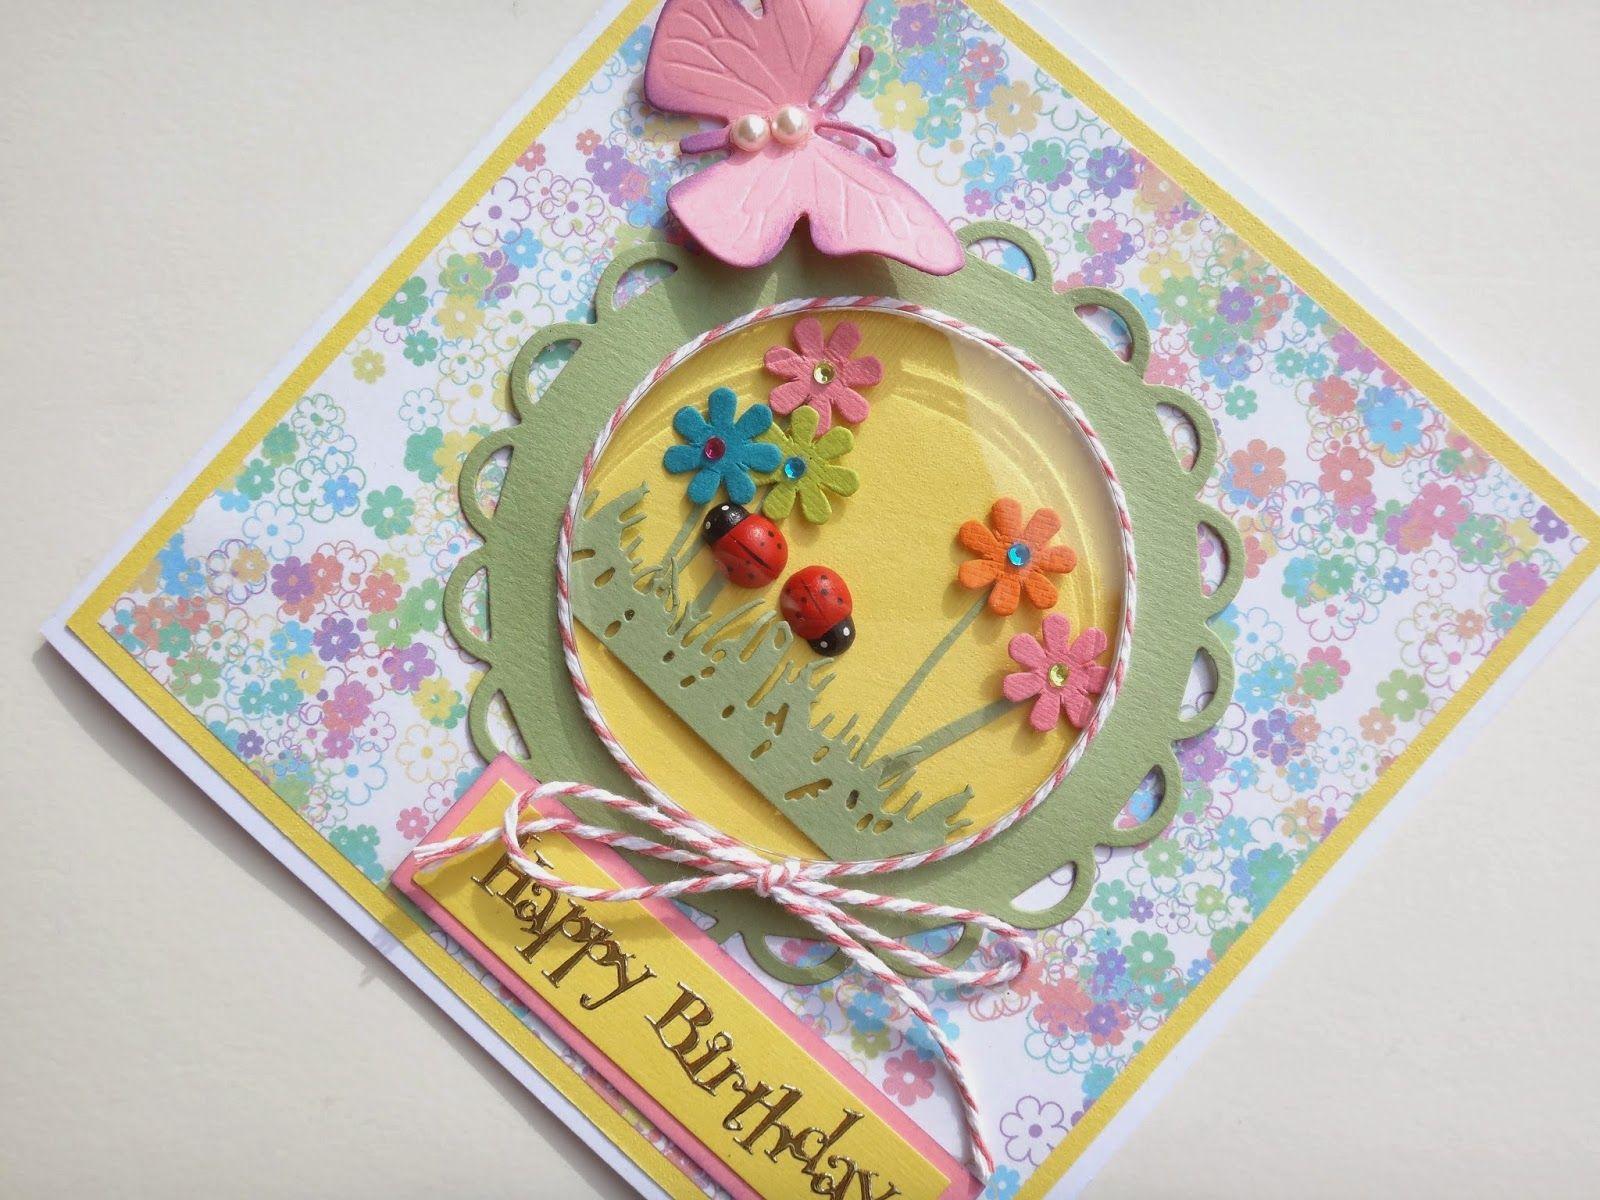 Ladybird And Flowers Shaker Card Birthday Cards Pinterest